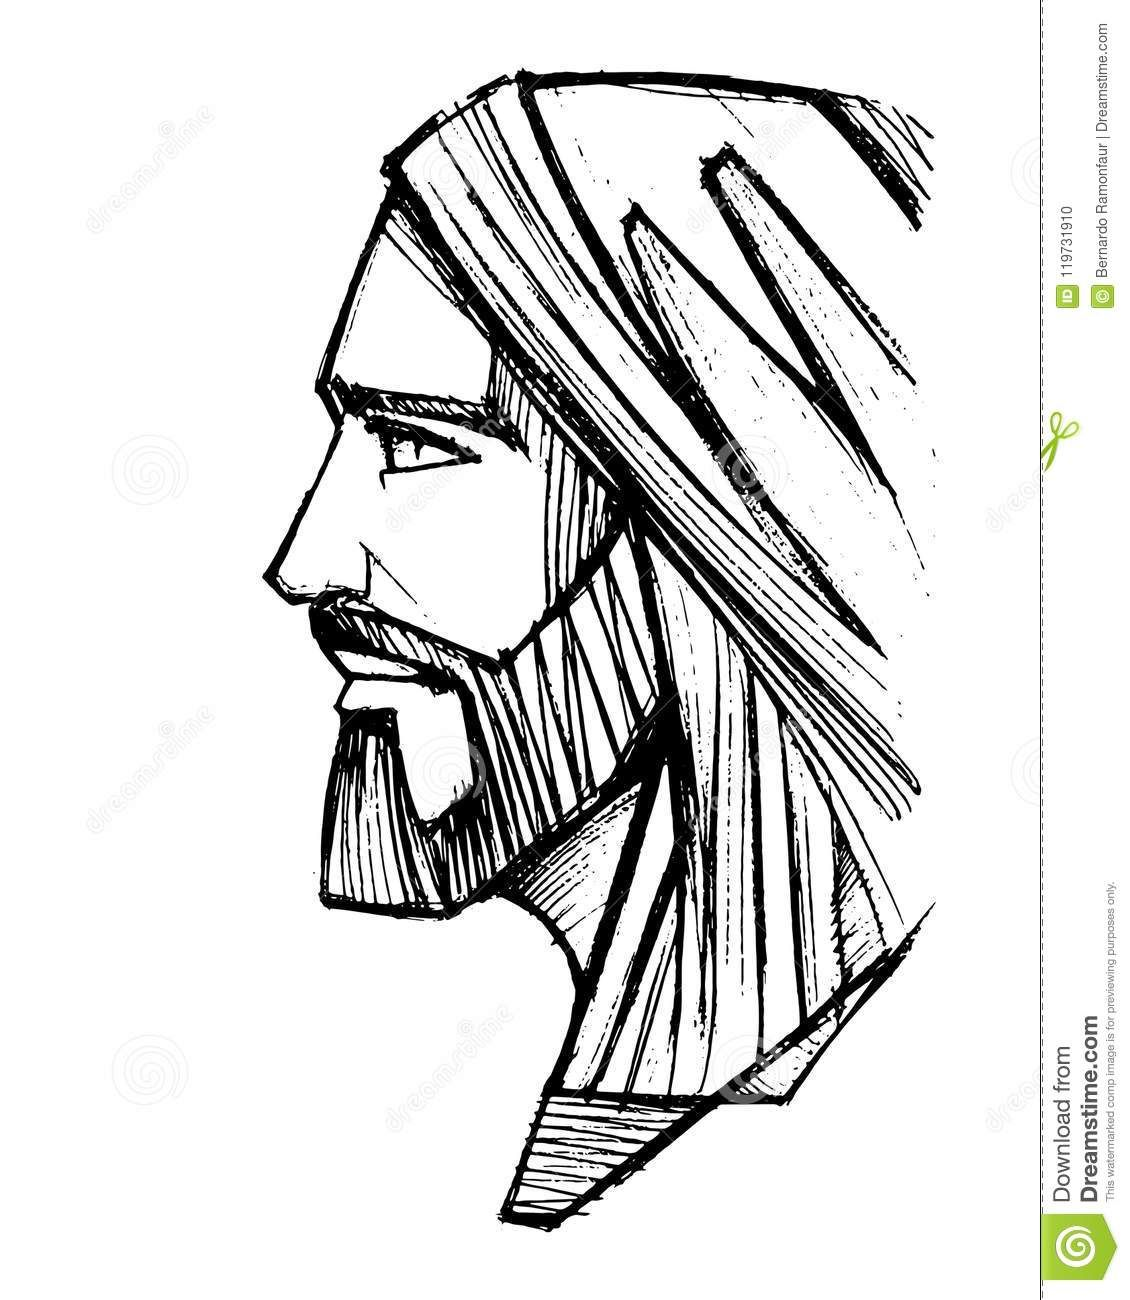 Pin De Vanessa Sejas En God En 2020 Arte De Jesus Manos Dibujo Dibujos De Jesus